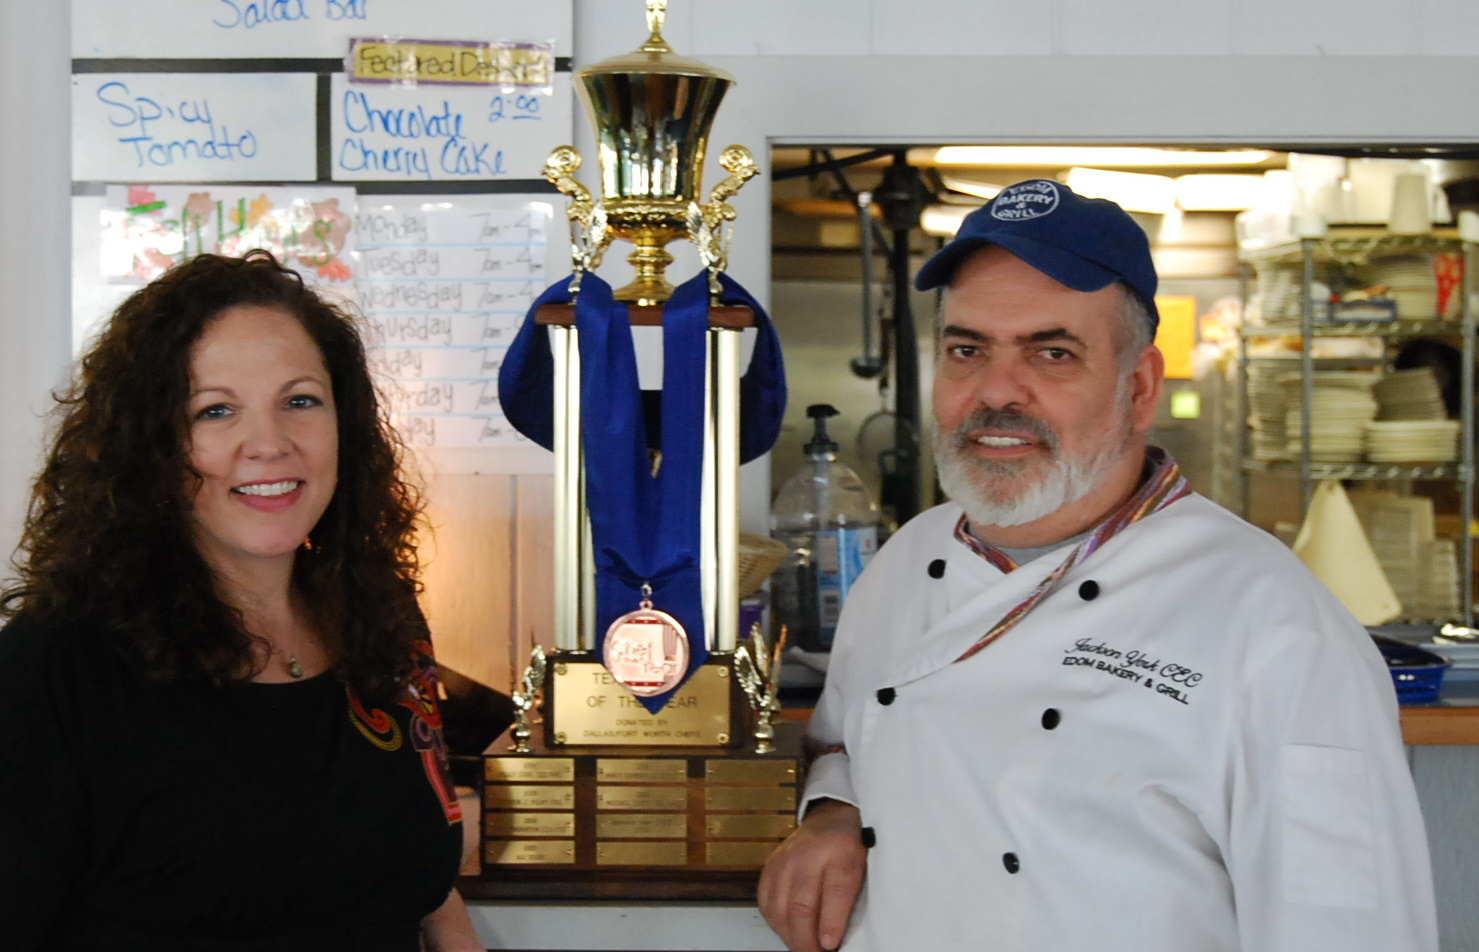 chefs-mtg-at-edom-bakery-046